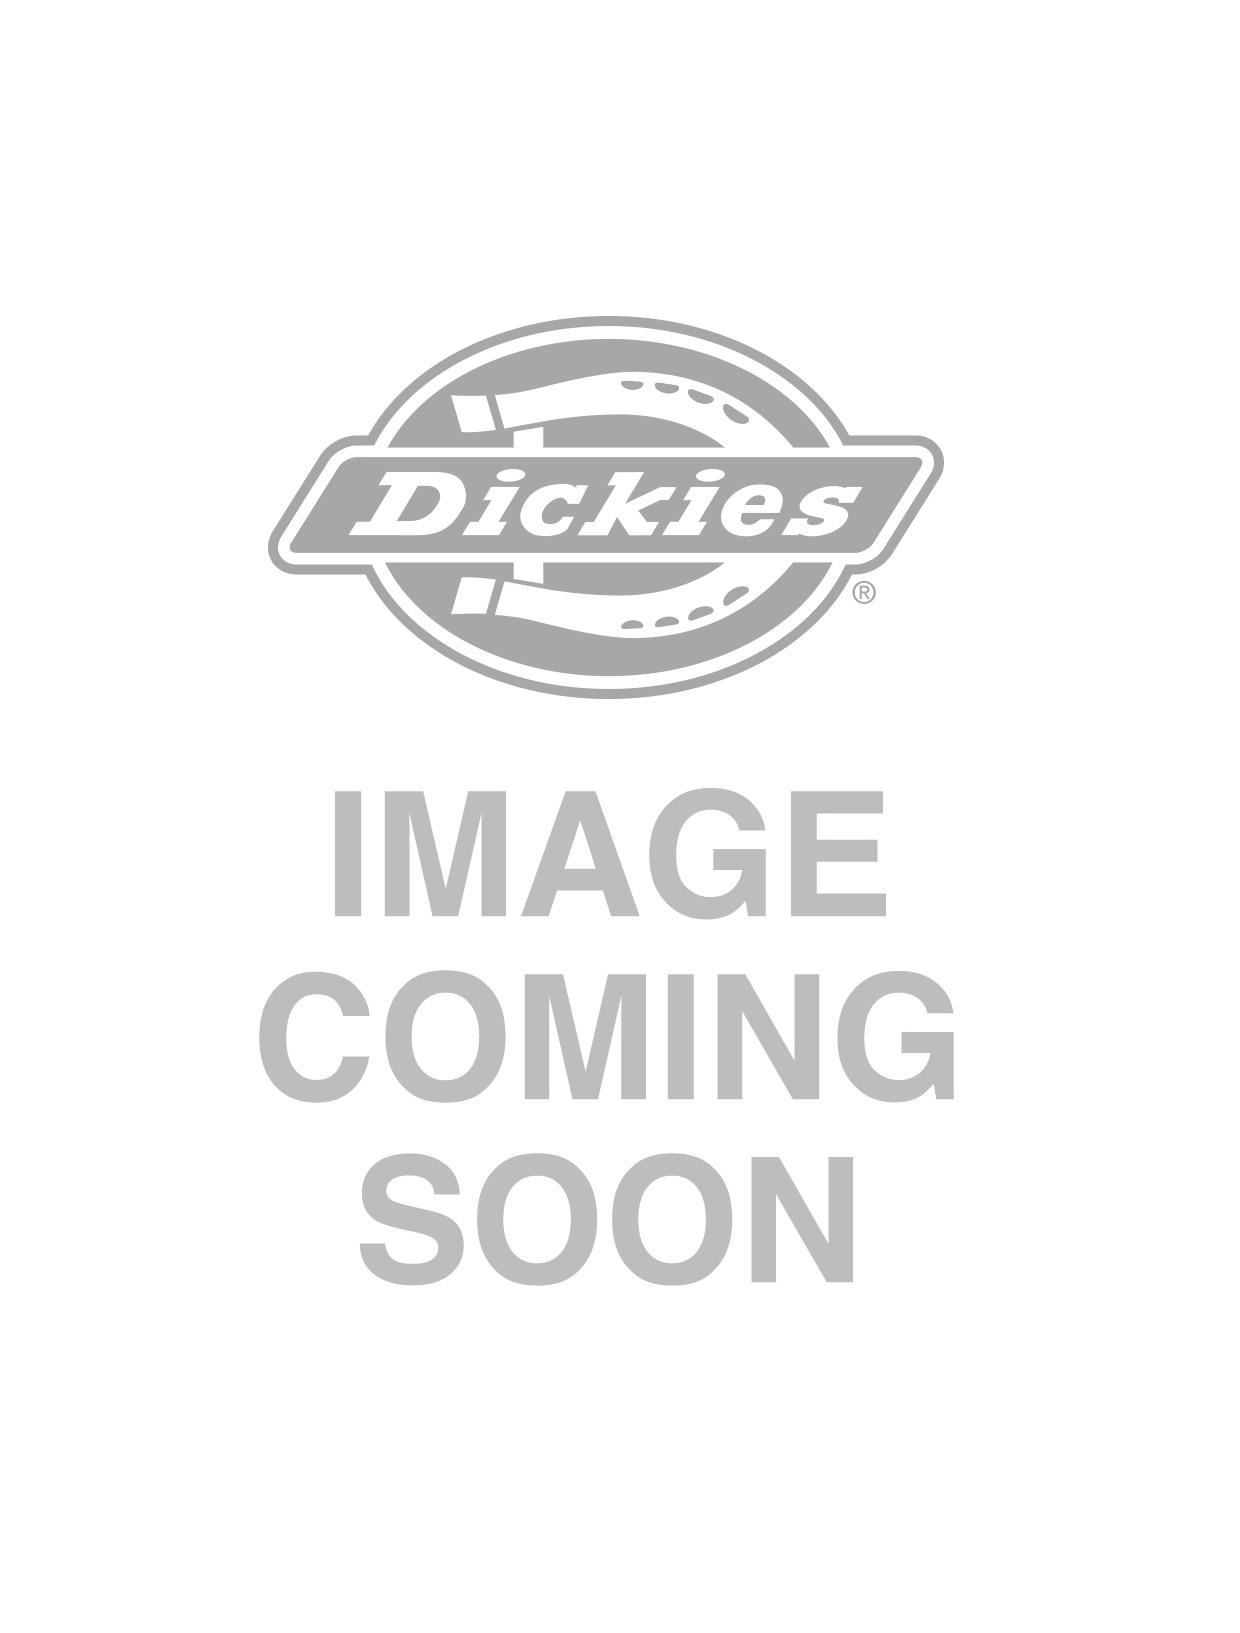 Dickies Melber Shirt